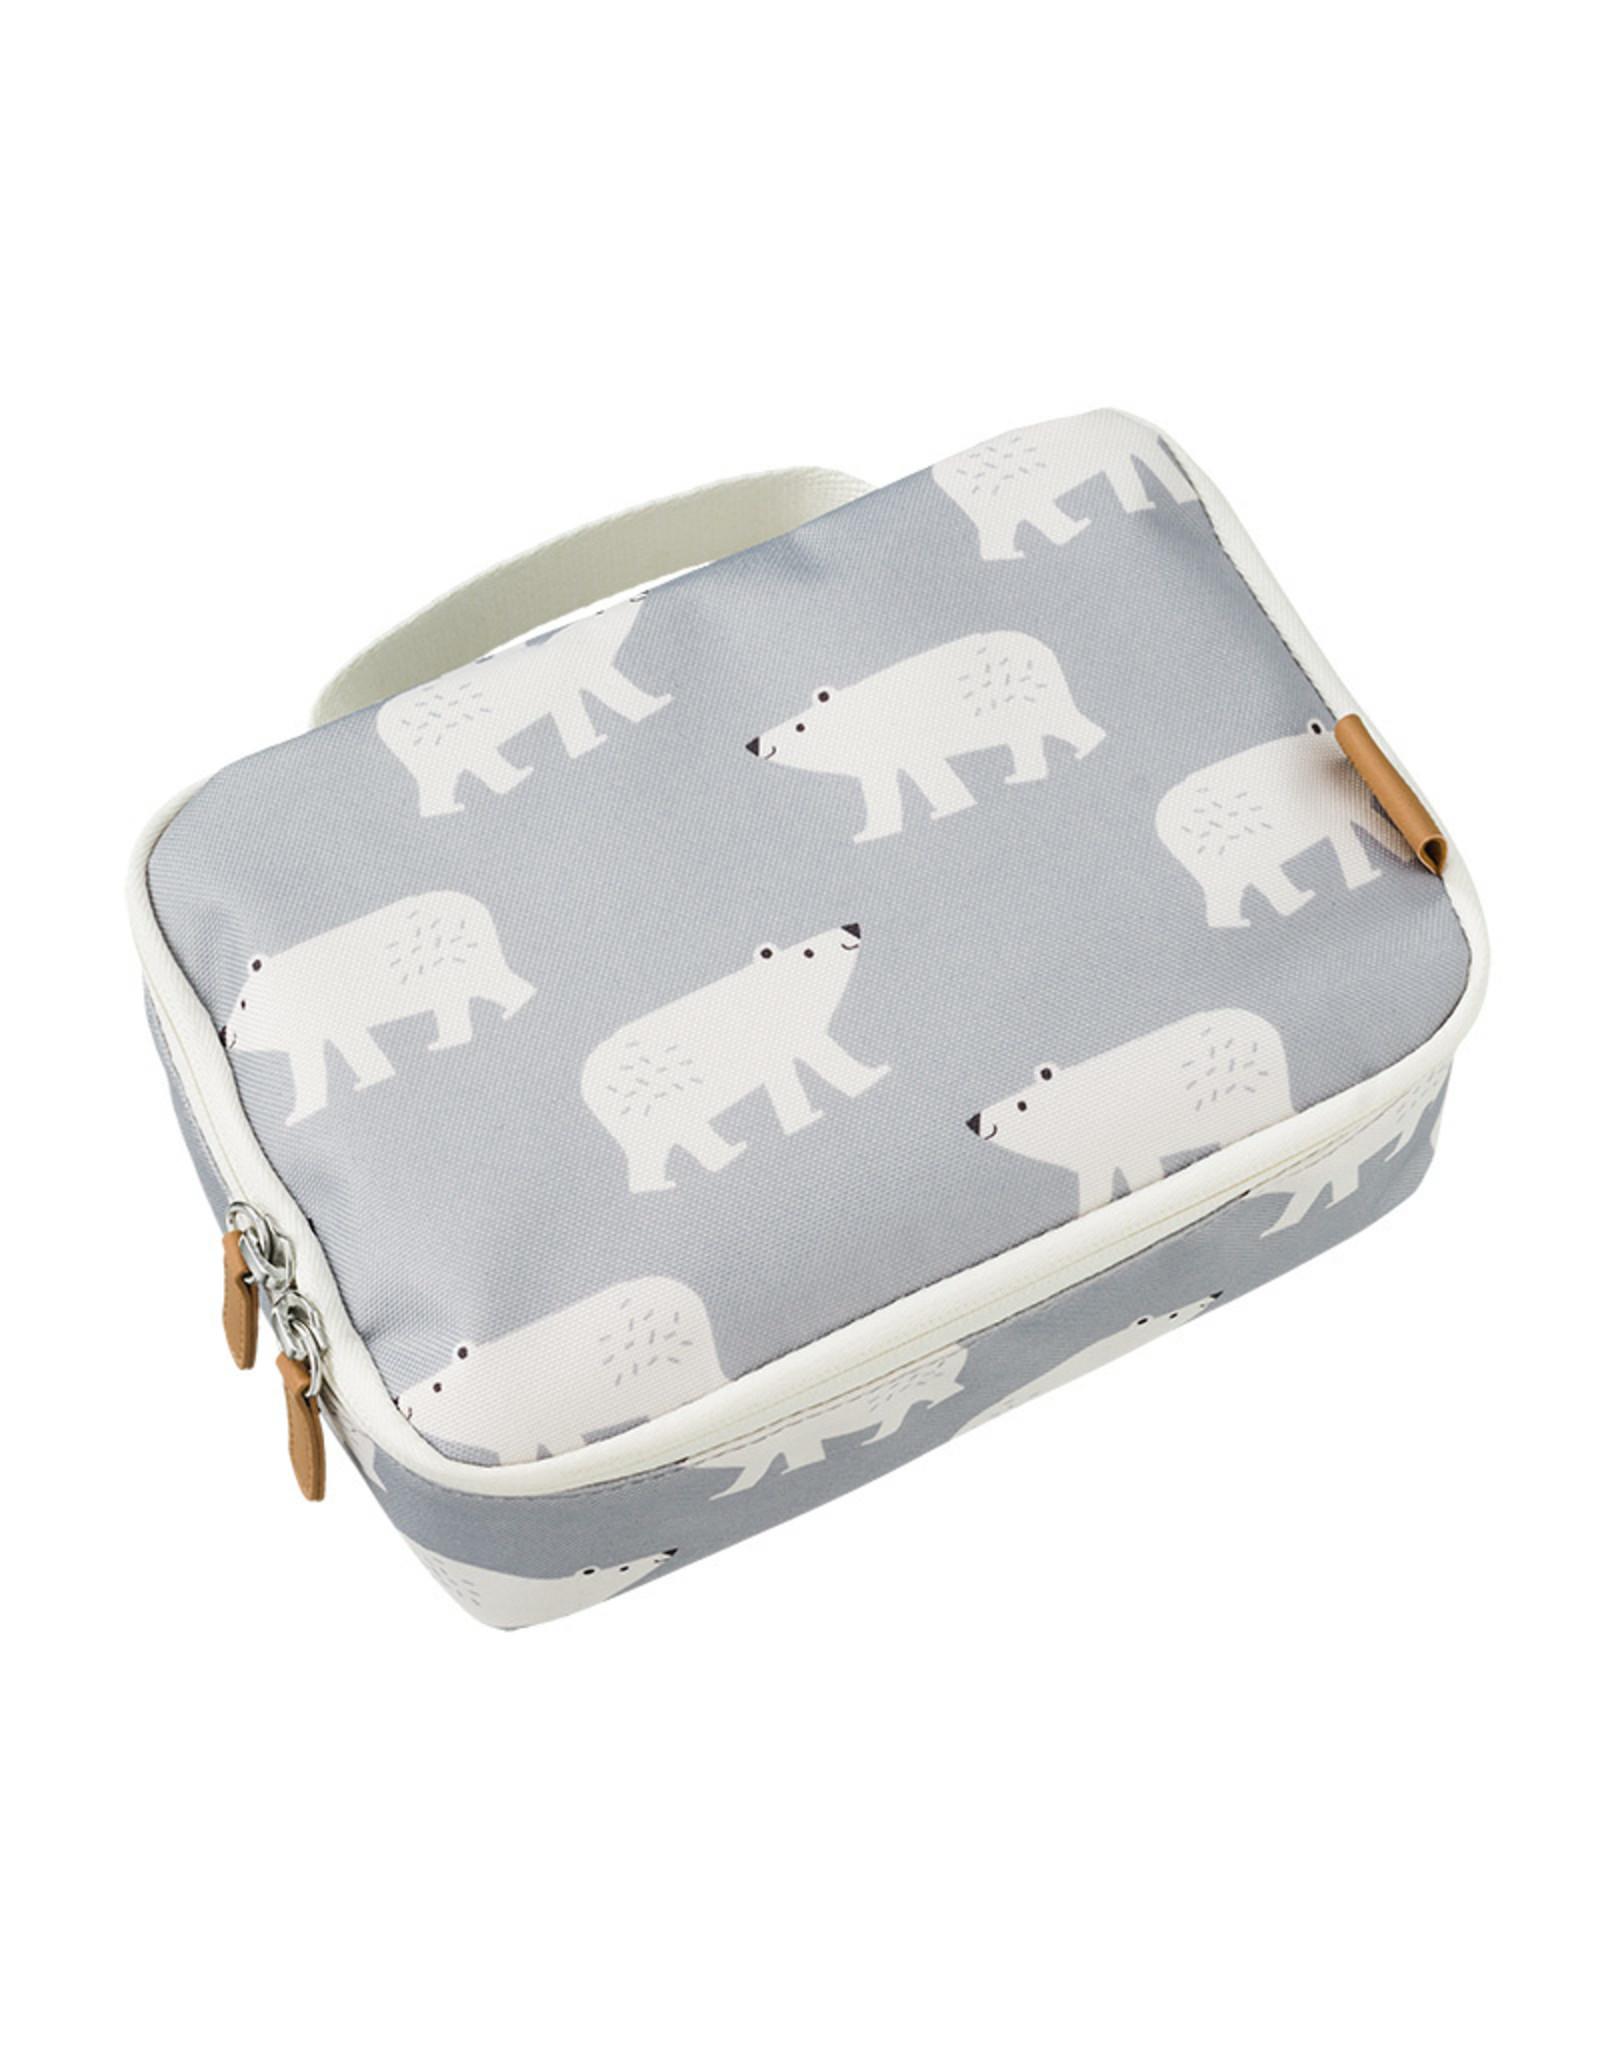 Fresk Lunch Bag - Polar Bear